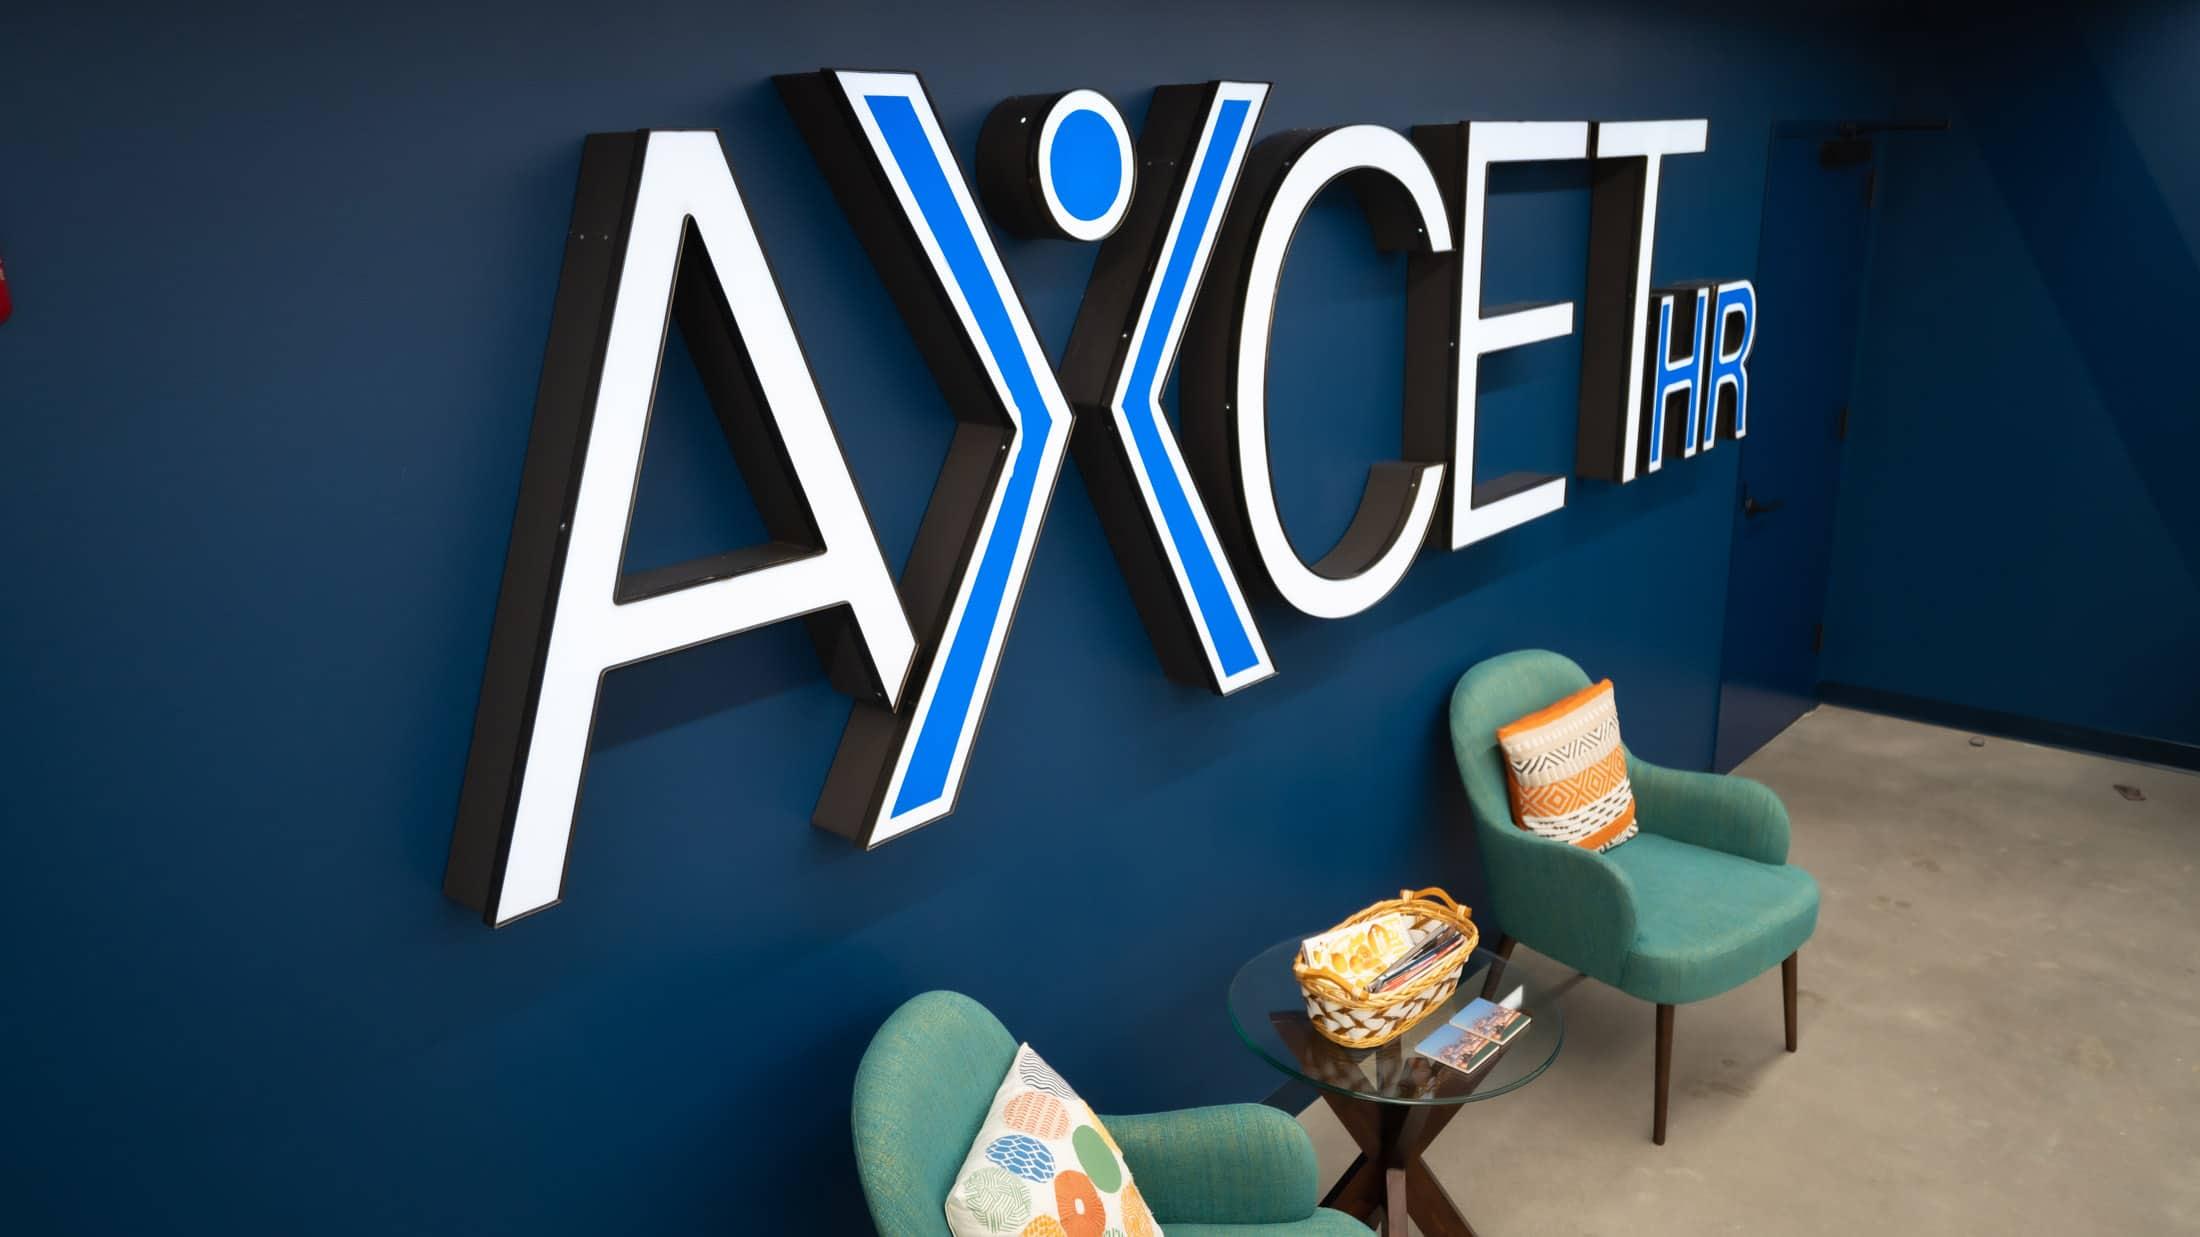 Axcet HR Solutions, Kansas City Employee Benefits